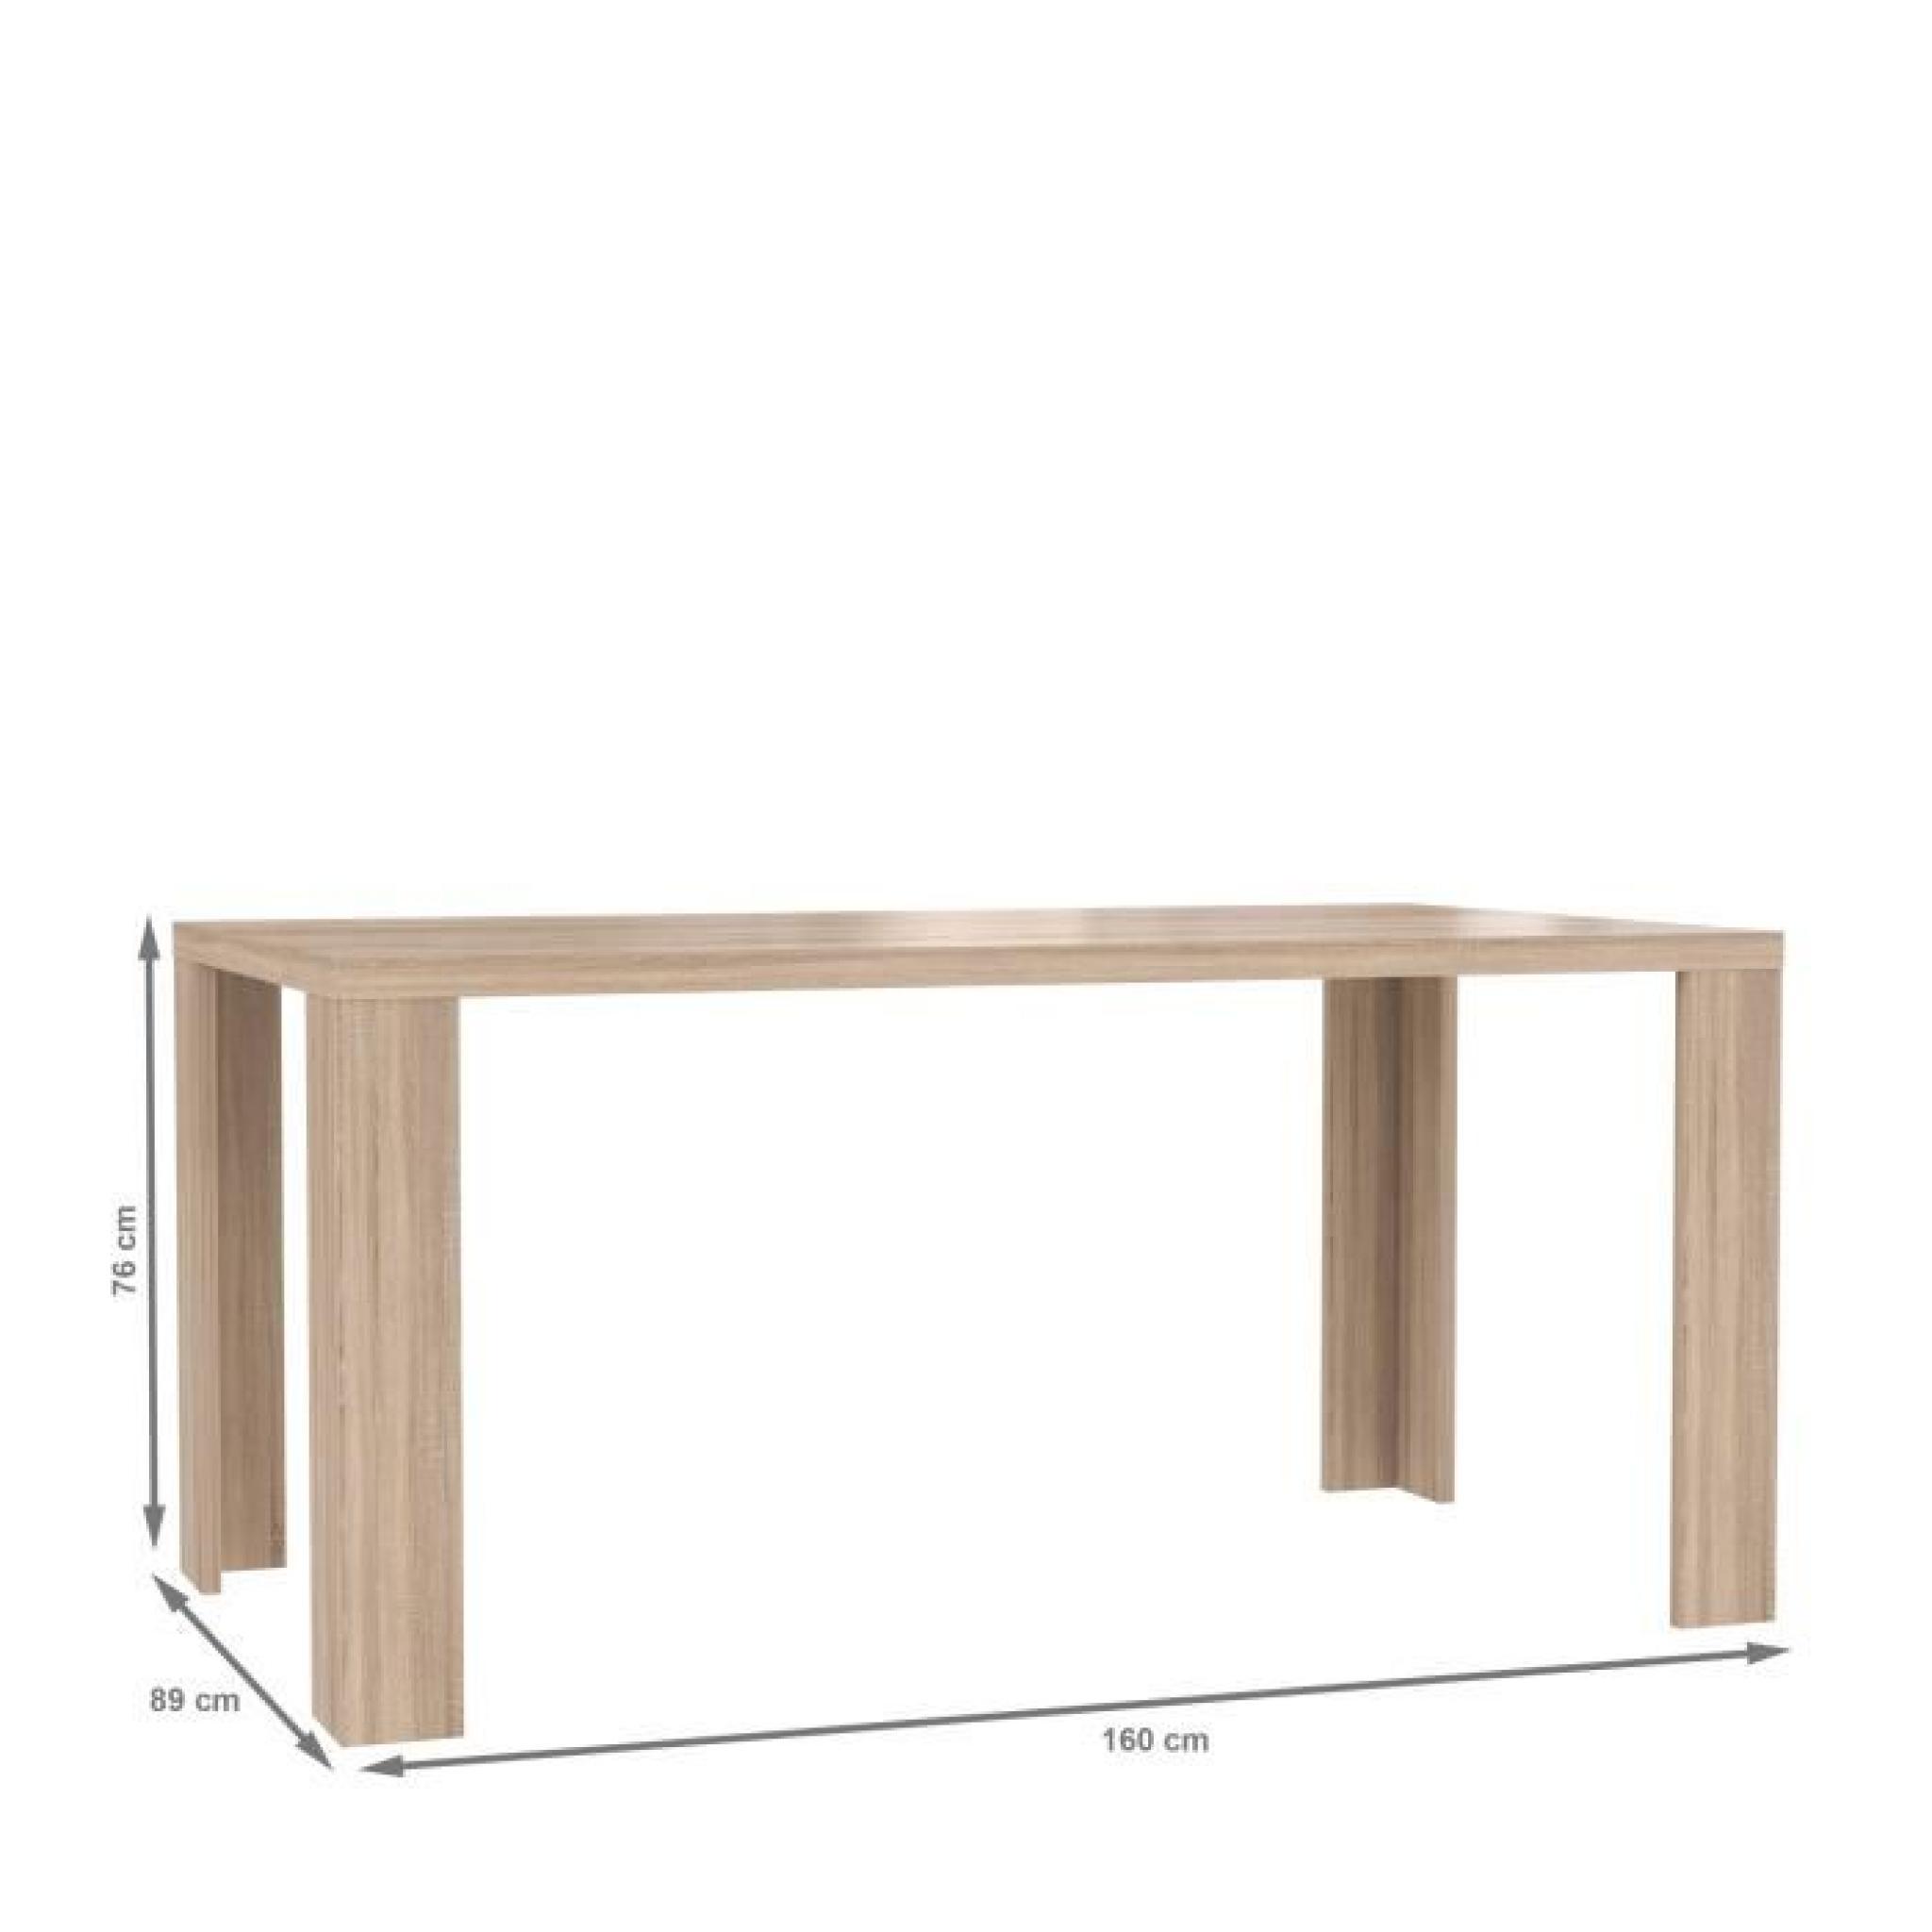 cm clair Table chêne 76 sonoma x décor CALPE 160 sChxQrdt